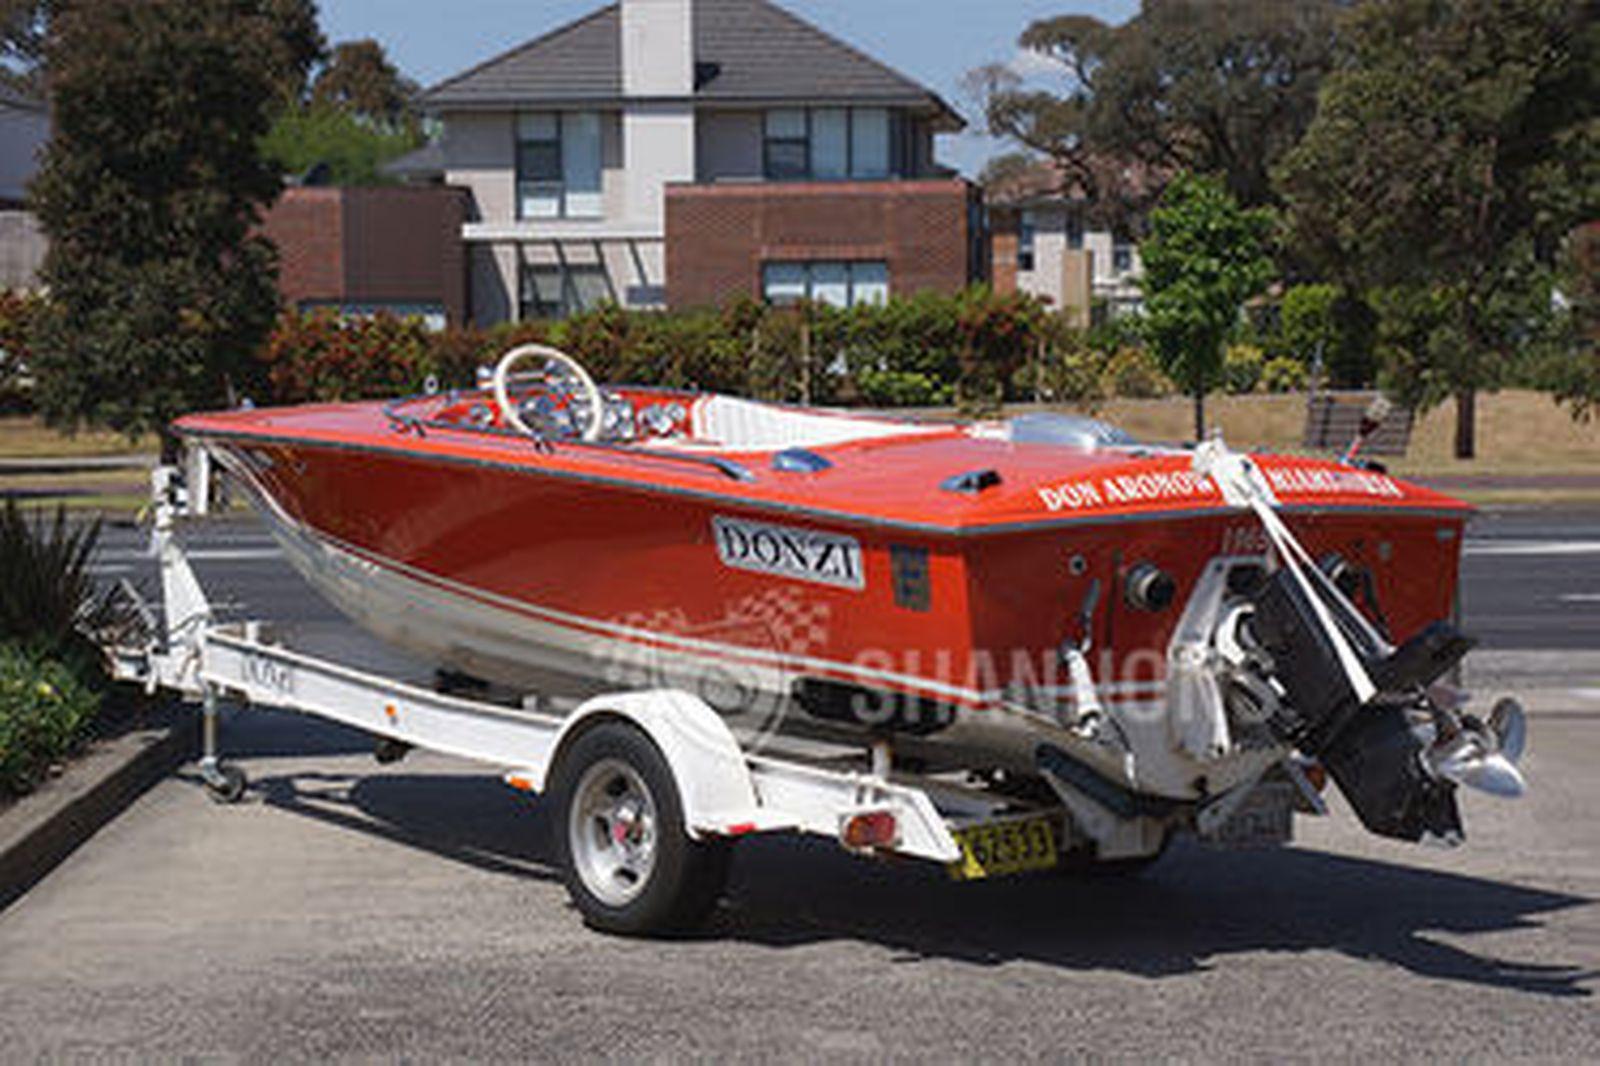 Sold: Donzi 'Sweet 16' Fibreglass Speed Boat on single axle